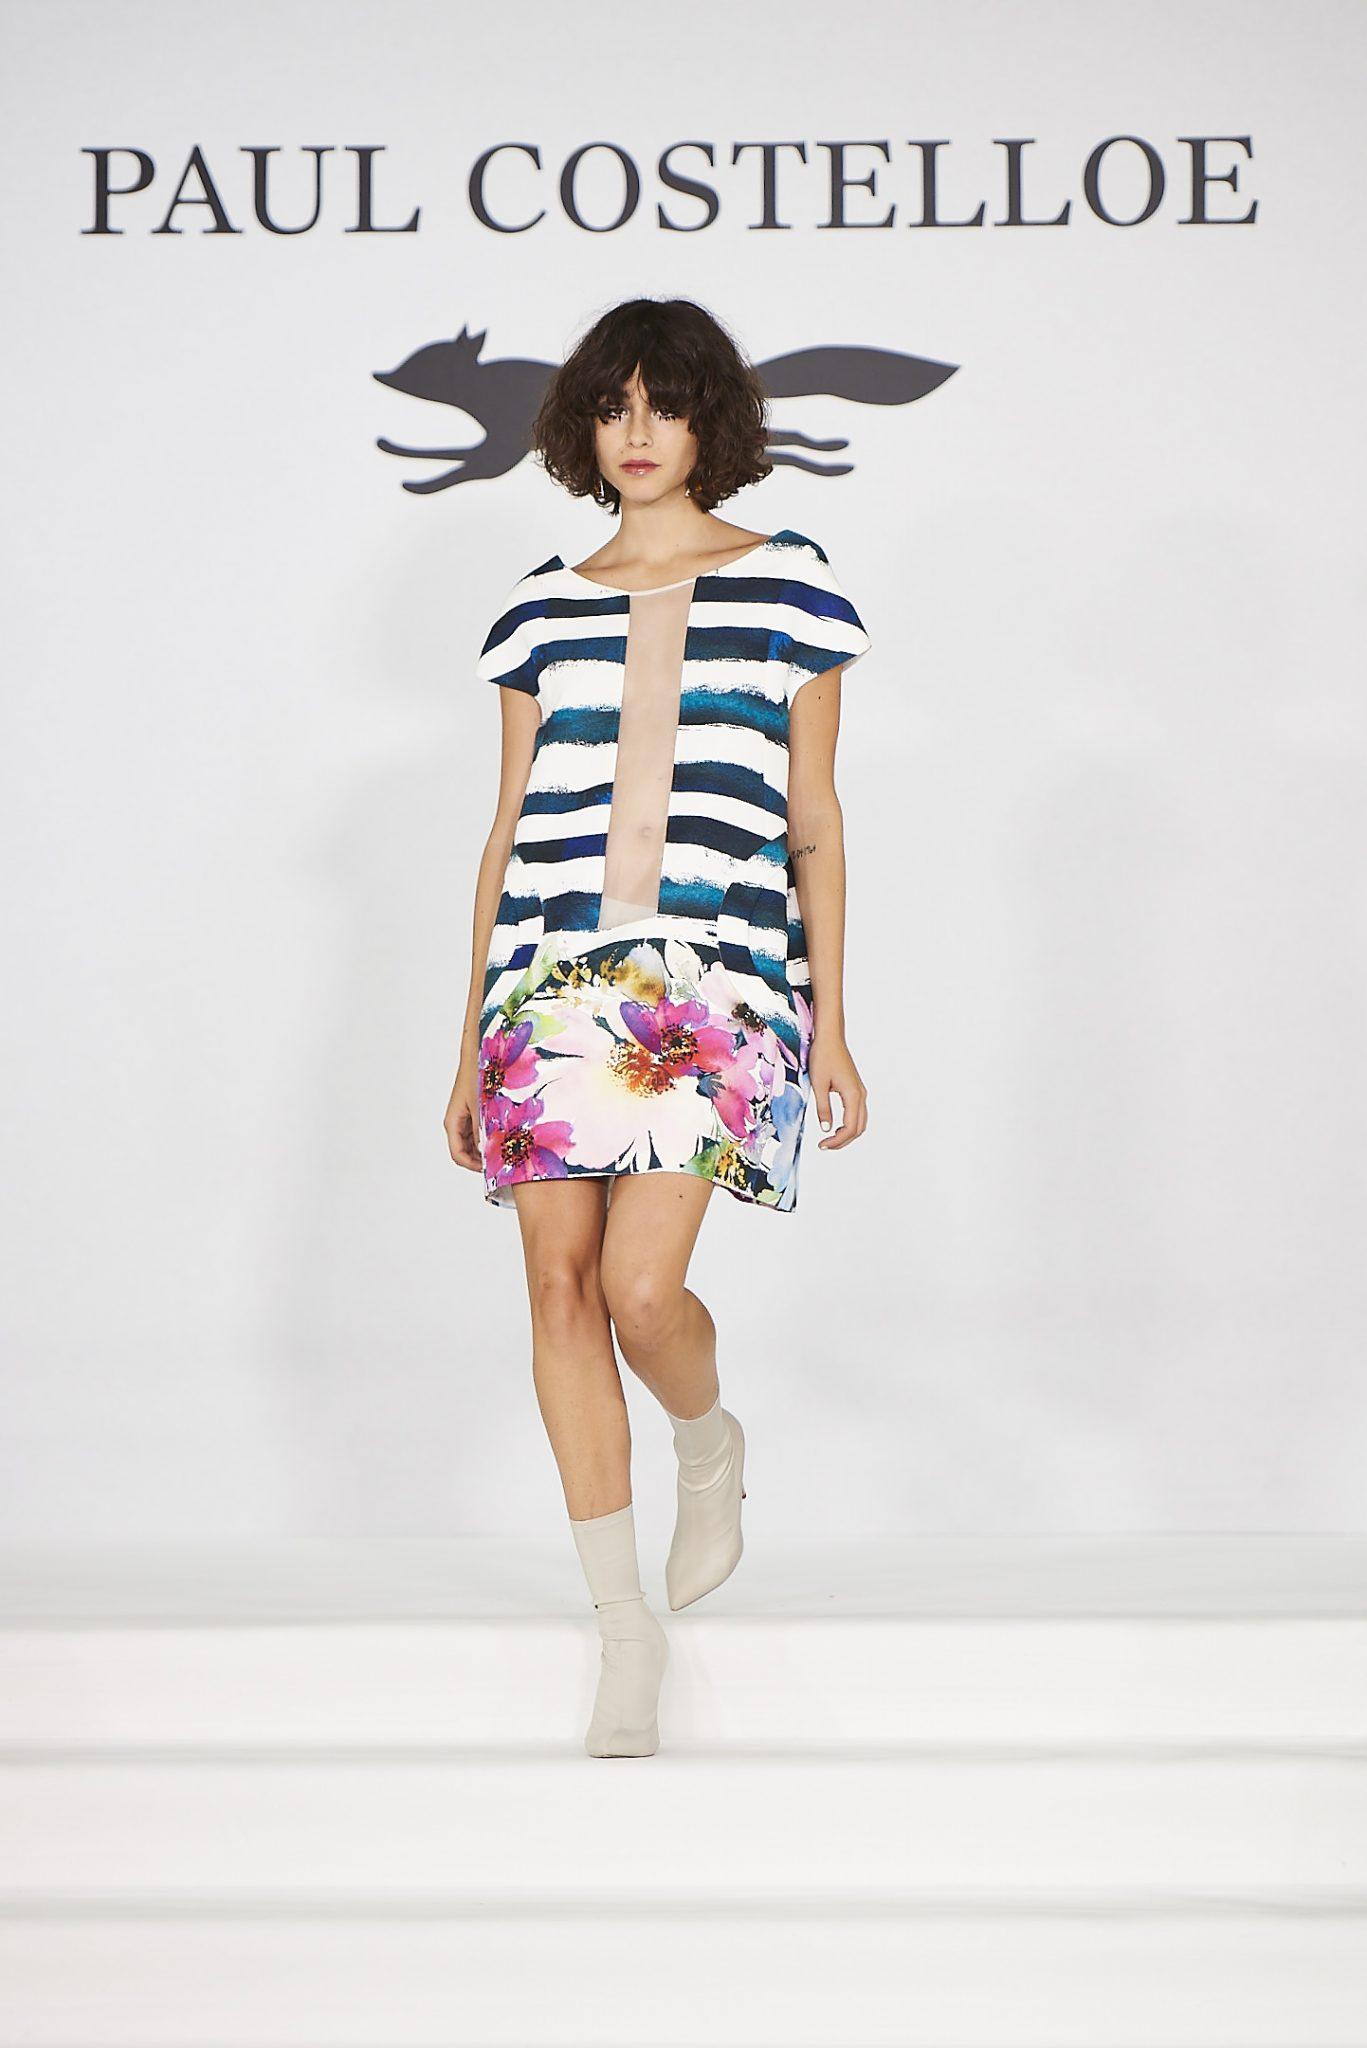 Vogue Williams and Chanelle McCoy lead Irish fashionistas Paul costelloe ladies fashion